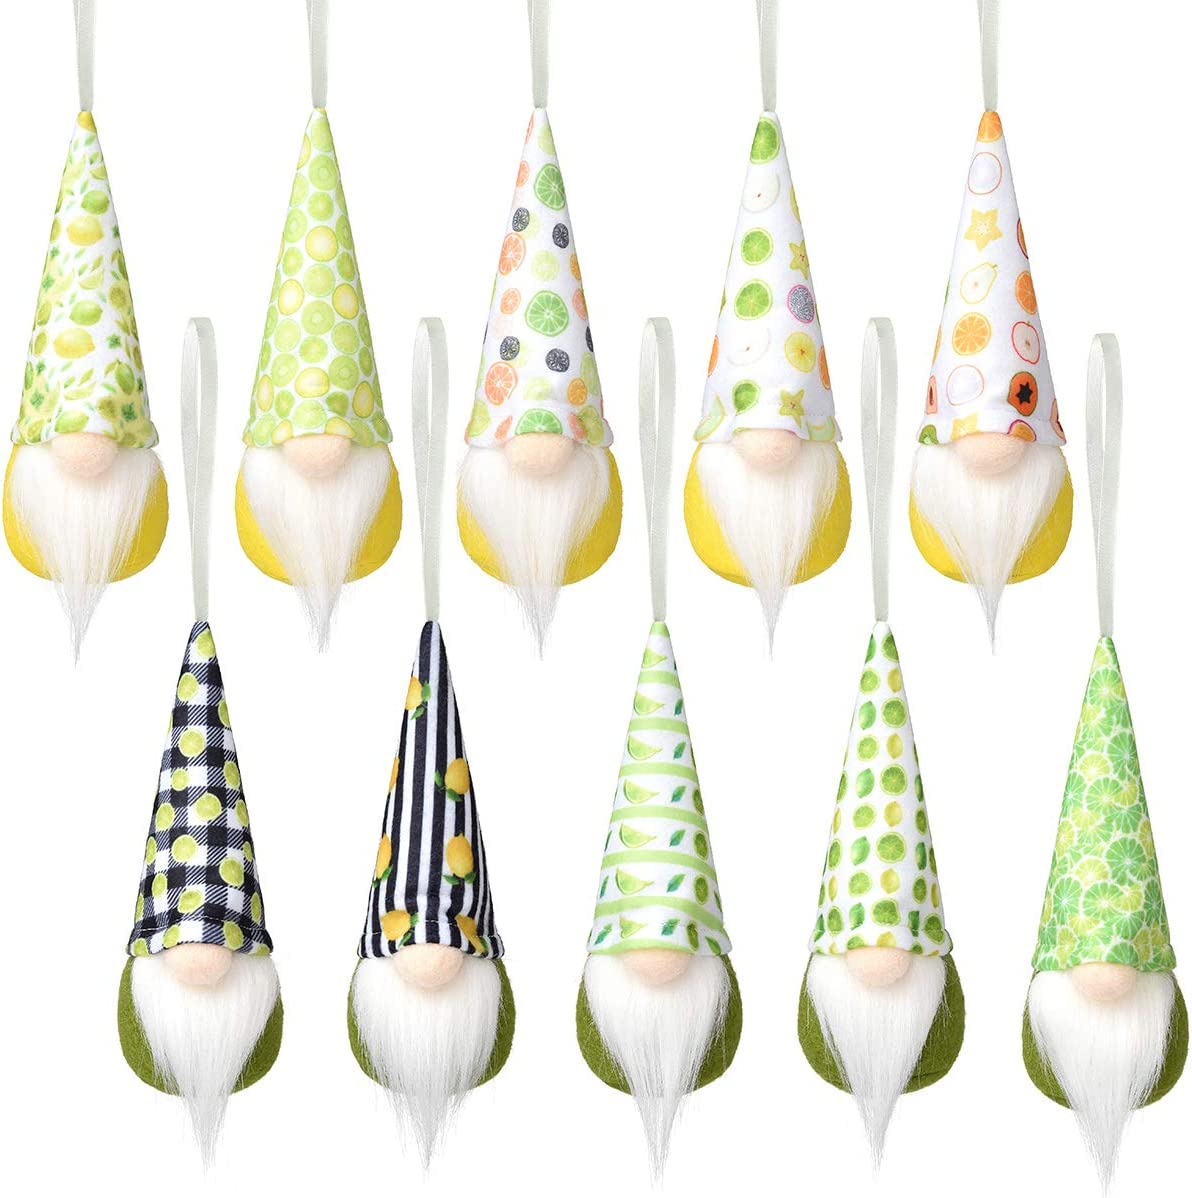 Lemon Hanging Gnome Ornaments Super Special SALE held Set 10 of Kitchen Decor Save money Handmade